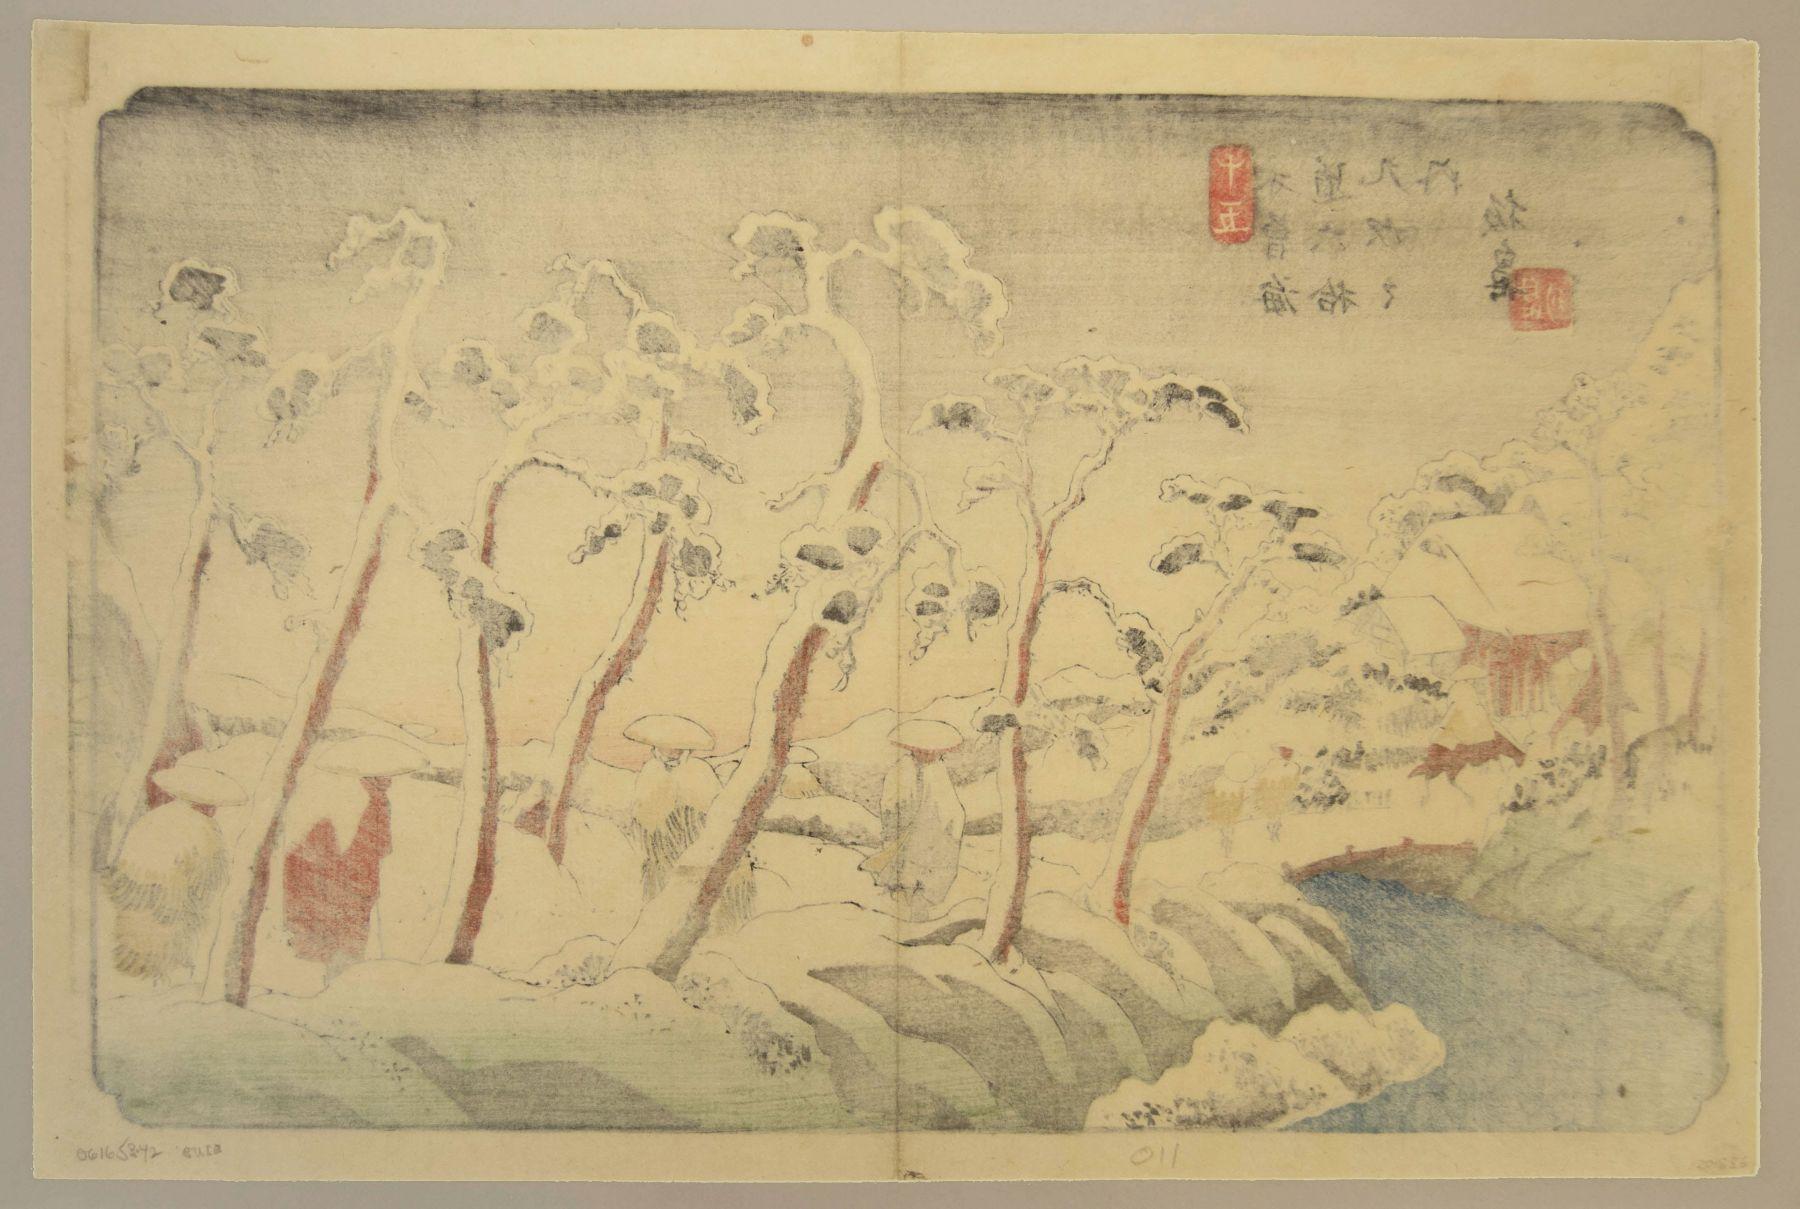 Keisai Eisen (1790-1848), 69 Stations of the Kisokaido Itahana